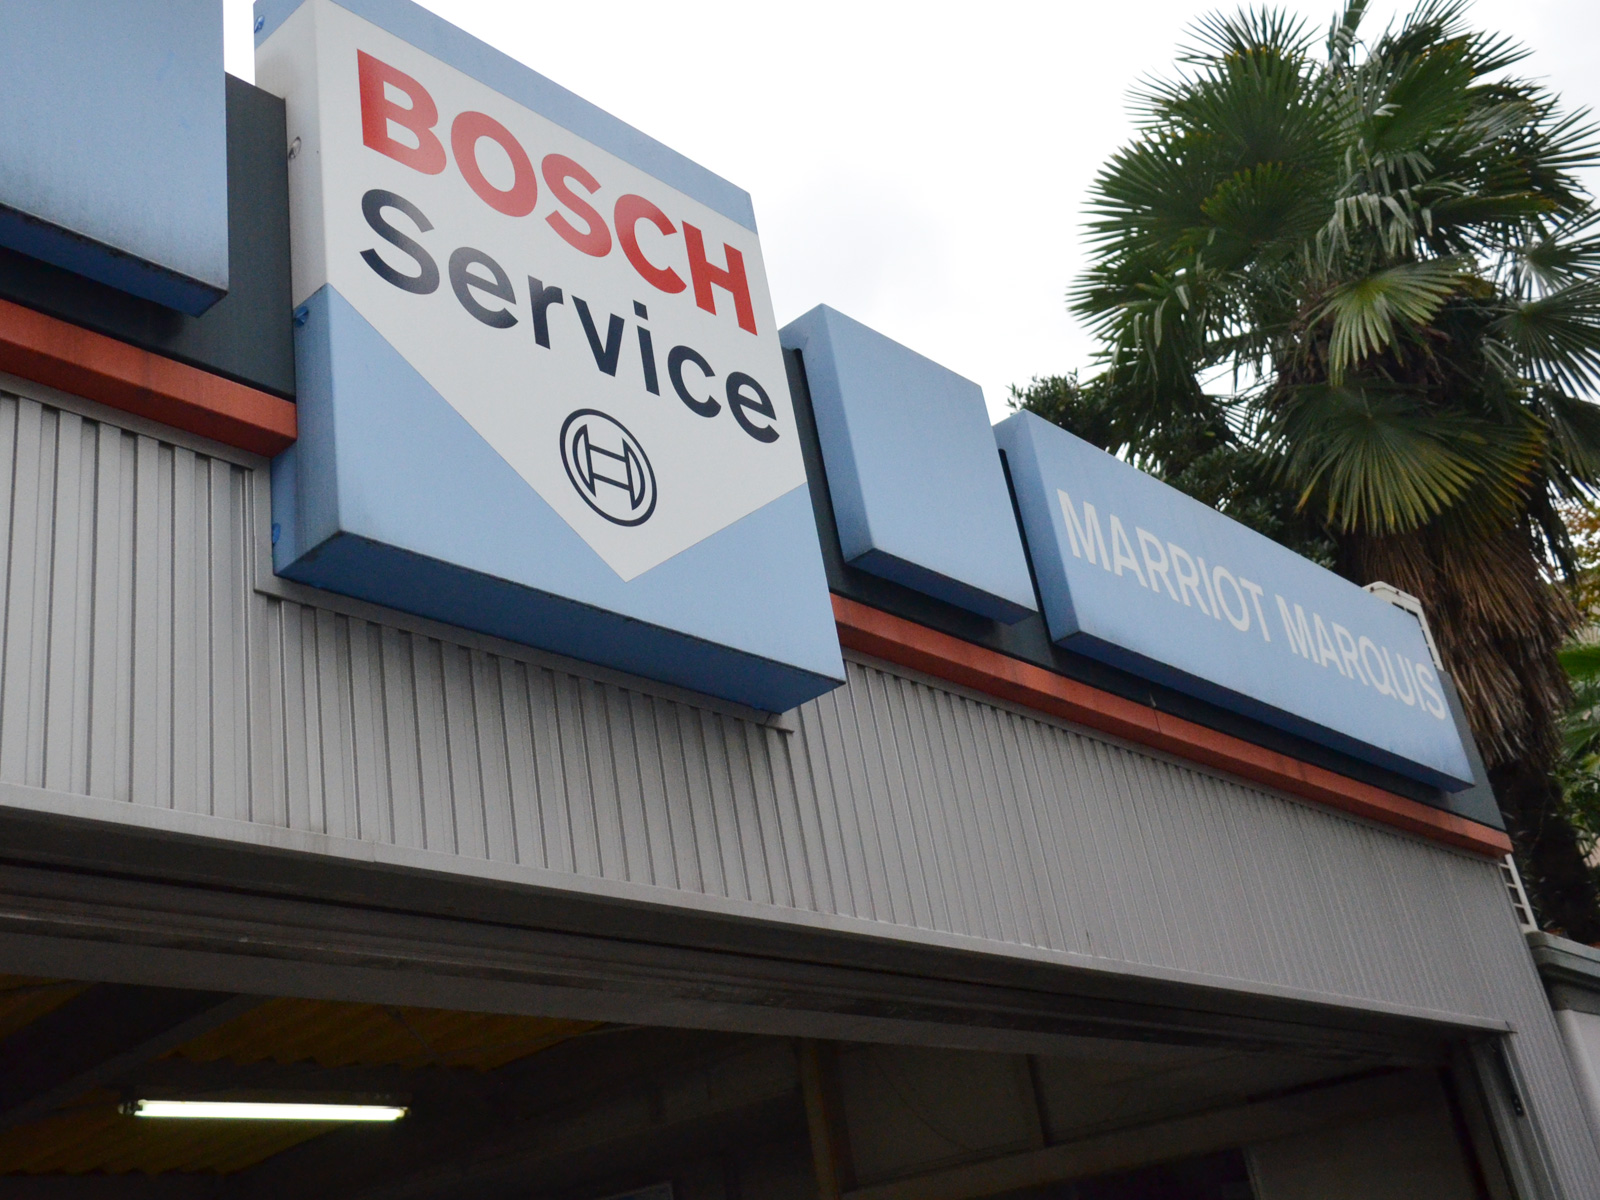 boshcecarservice